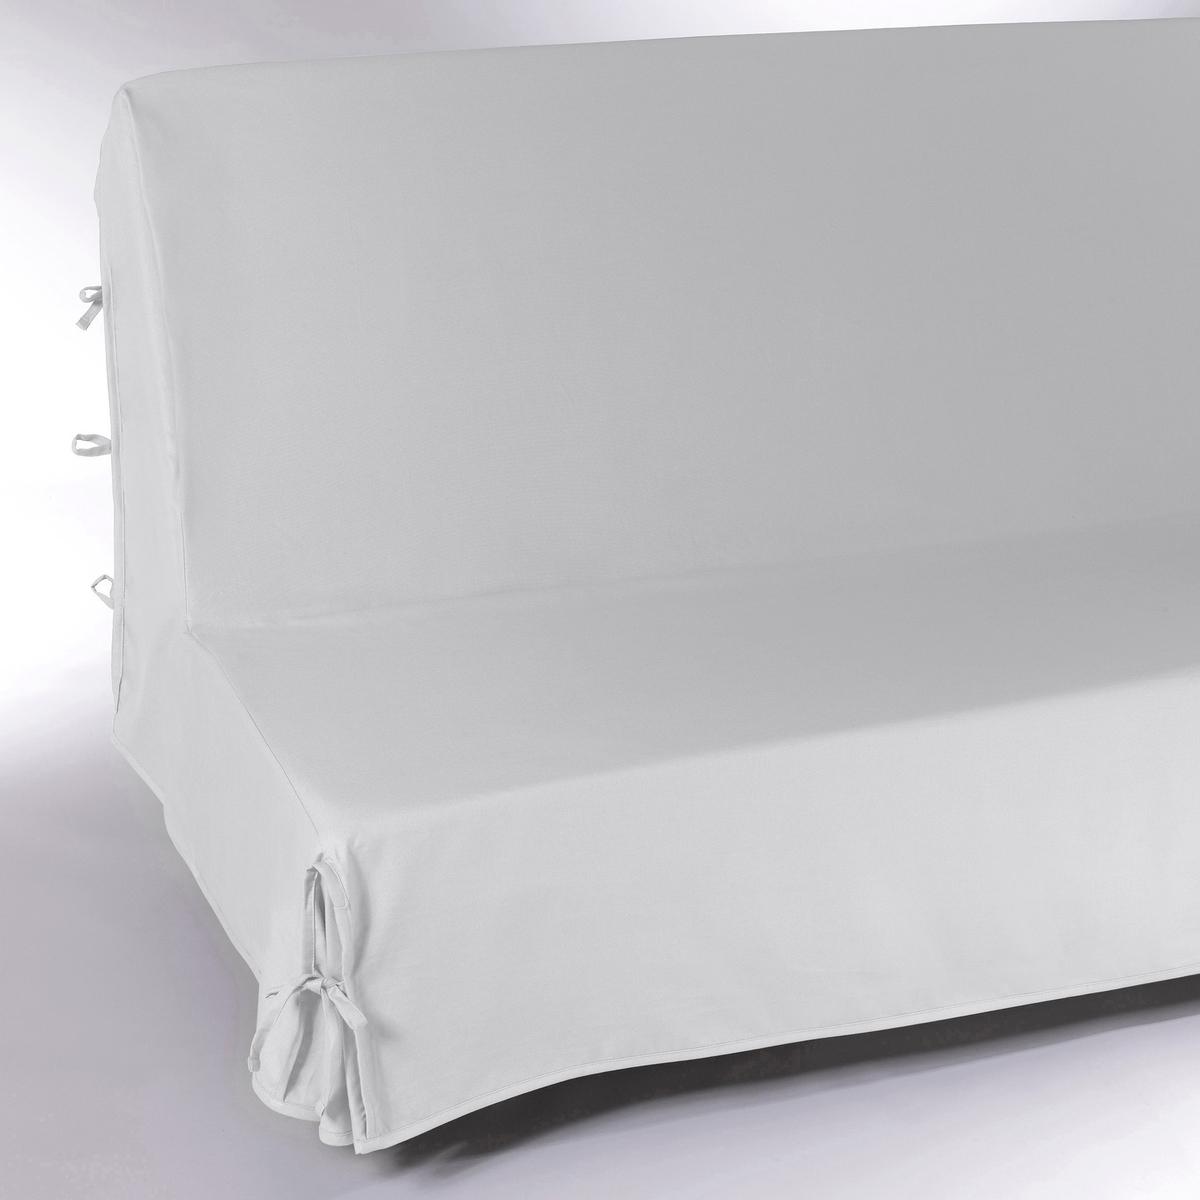 Чехол La Redoute Для раскладного дивана SCENARIO 140 см белый чехол стеганый для раскладного дивана scénario